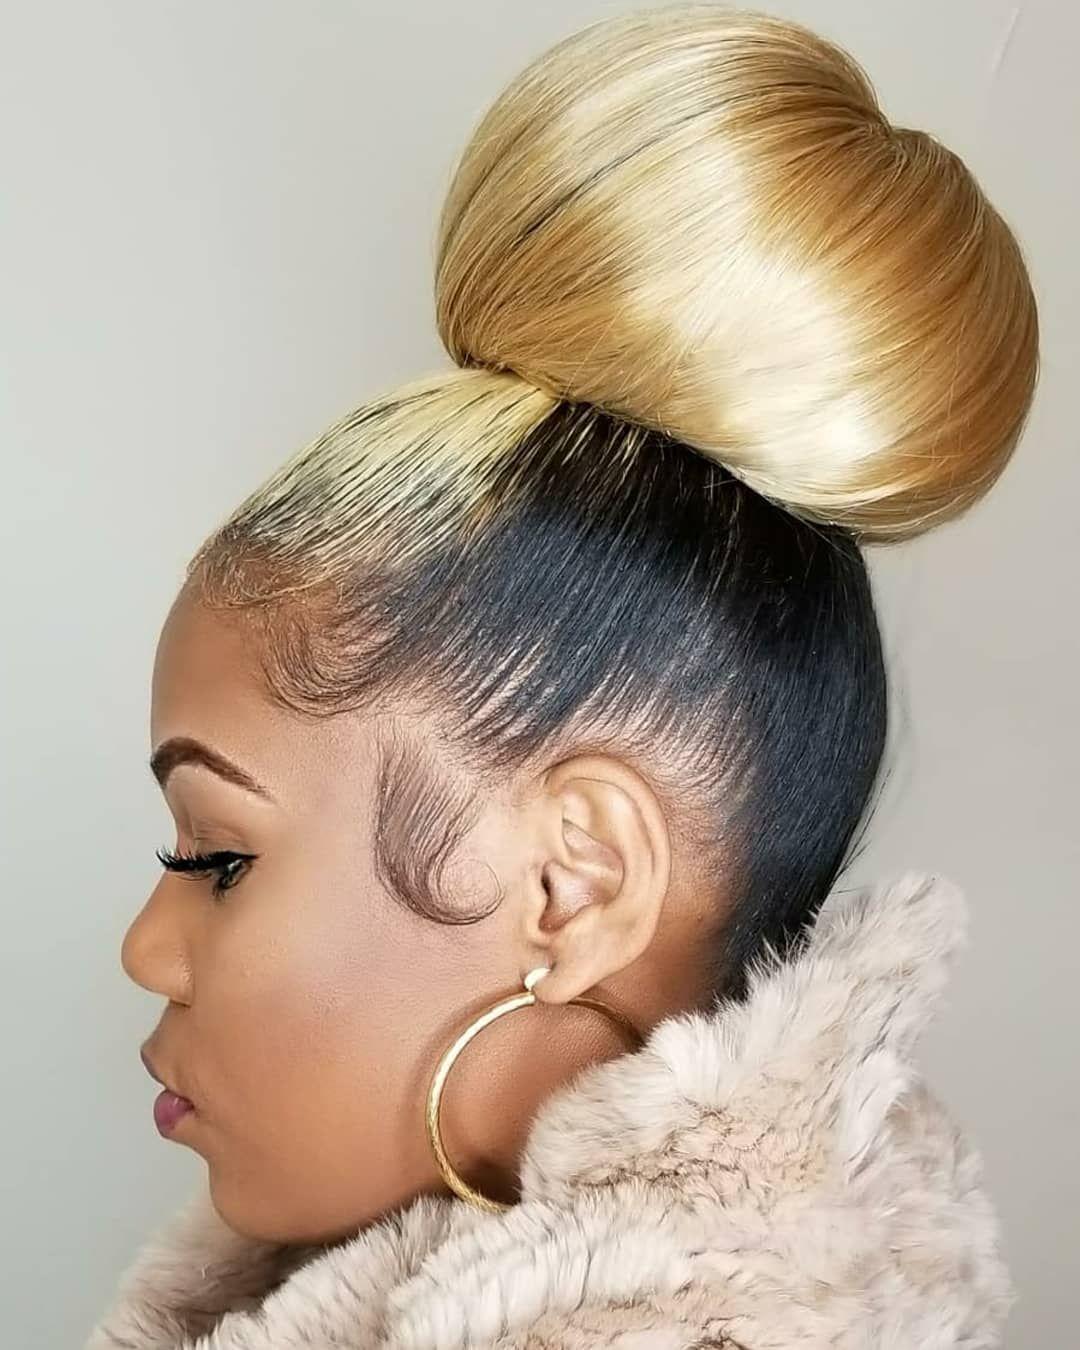 New Youtube Tutorial Alert Tap The Link In Sosheargenius Bio To Learn How To Do This Jumbo Ballerina Bun Black Hair Bun Hair Styles Bun Hairstyles